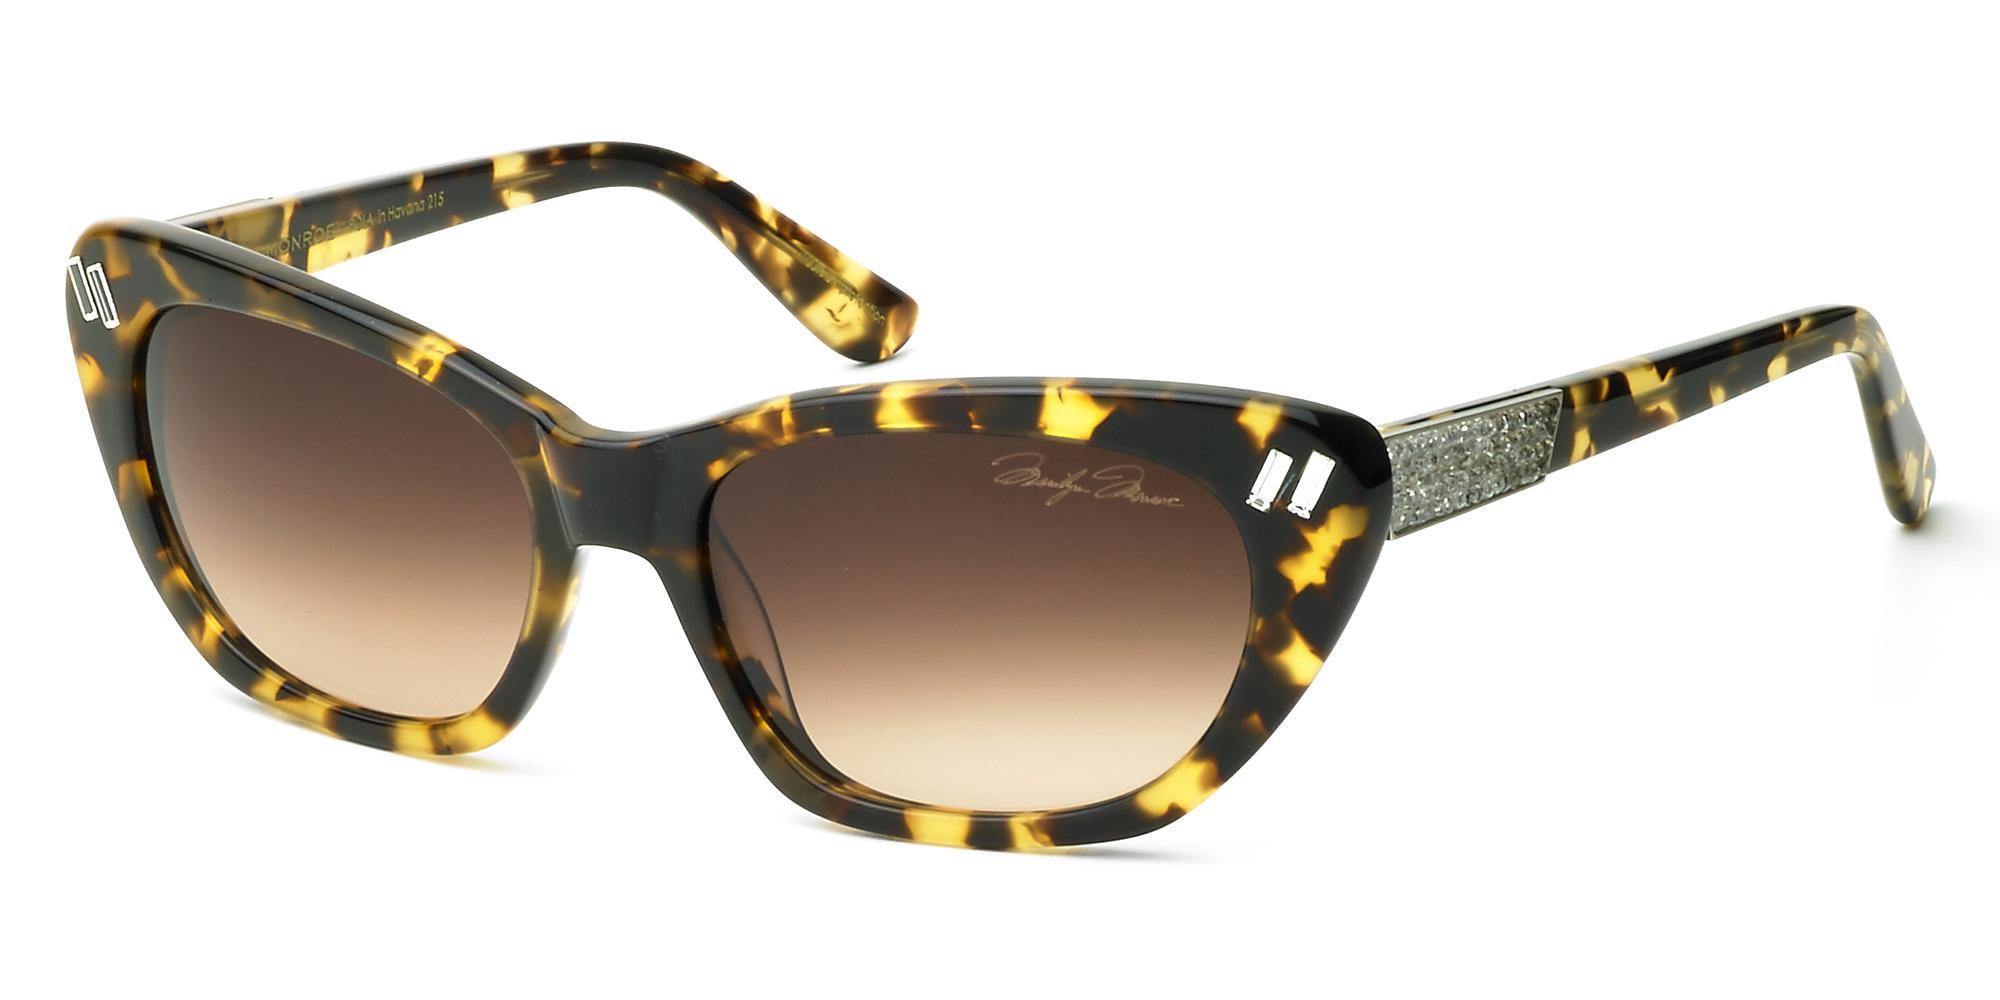 C2 MMSPOLA Sunglasses, Marilyn Monroe